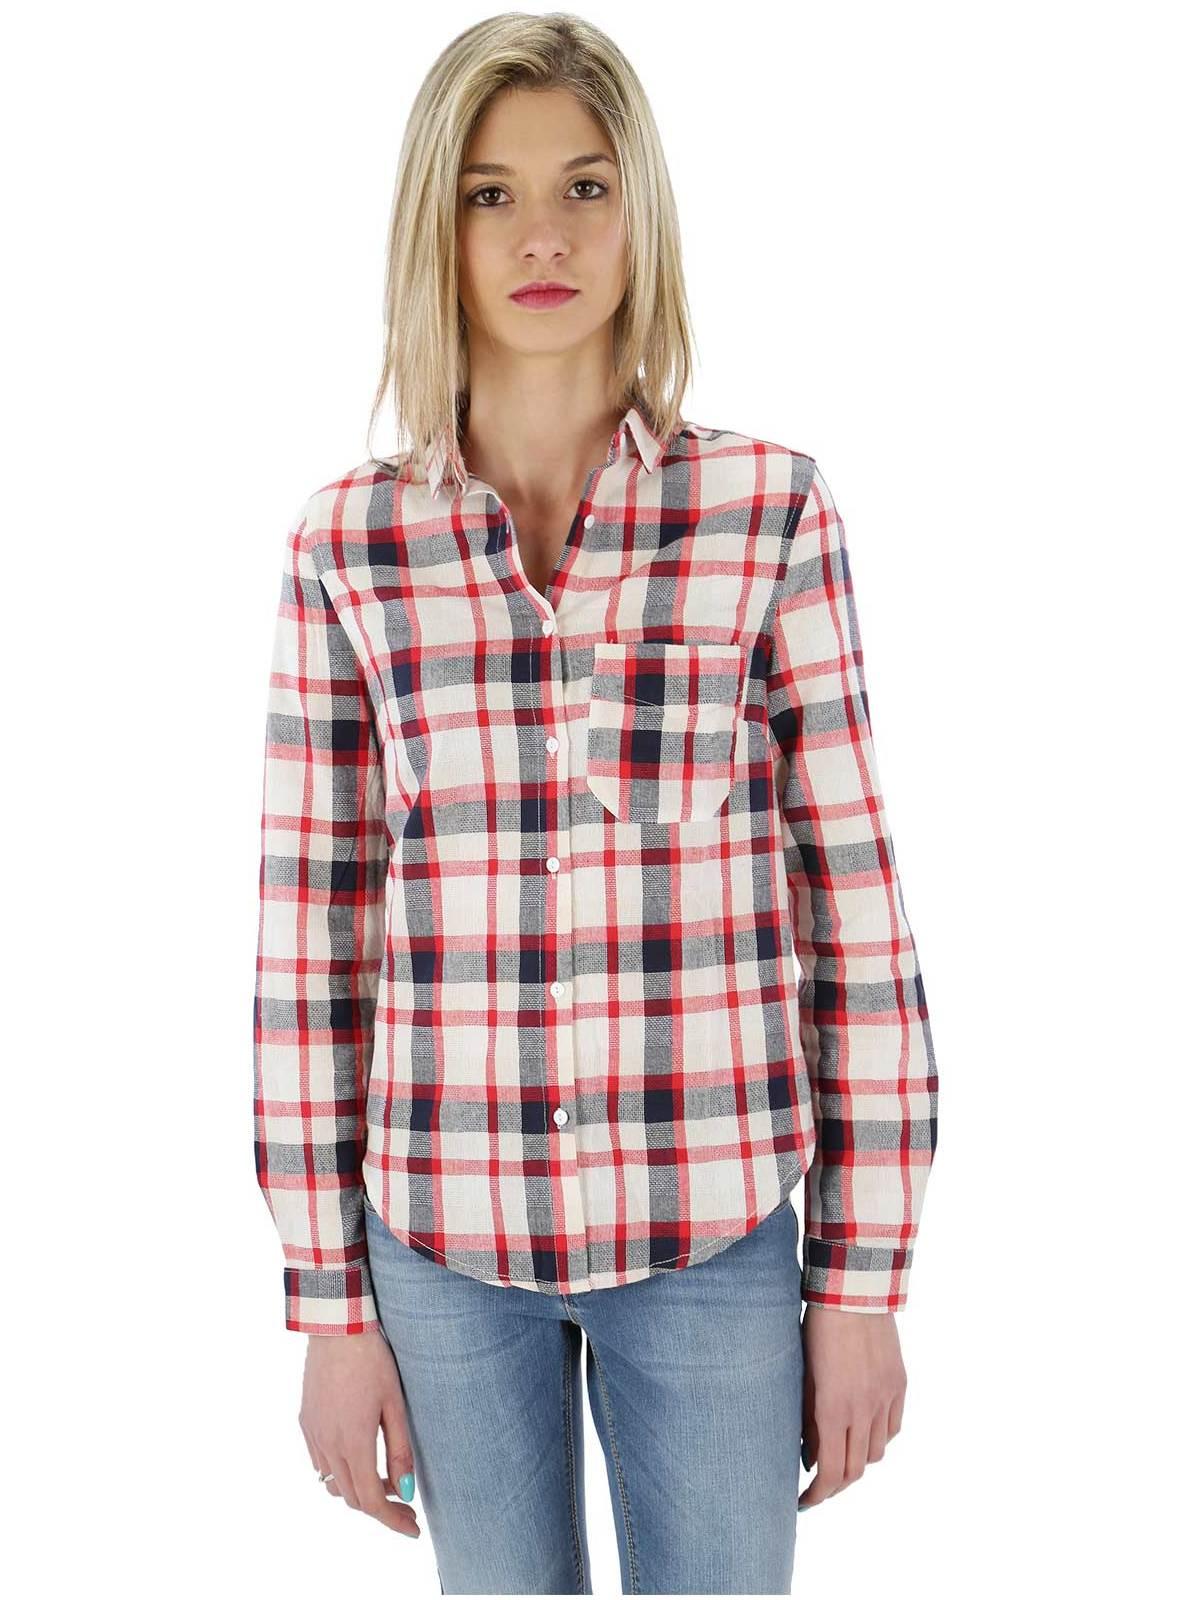 Camicia Chiusura Bottoni solada | MecShopping